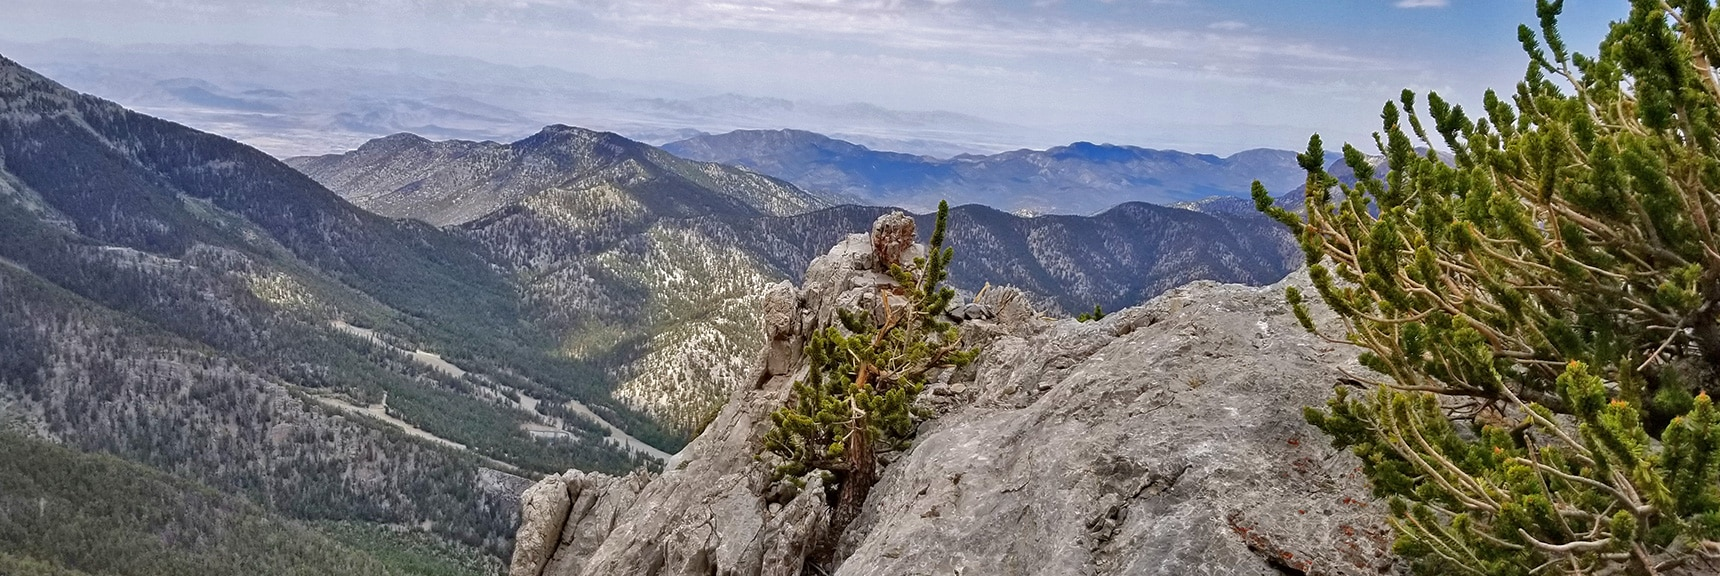 View Toward Pahrump Valley and Telescope Peak from Mummy's NW Cliffs | Mummy Mountain NW Cliffs | Mt Charleston Wilderness | Spring Mountains, Nevada